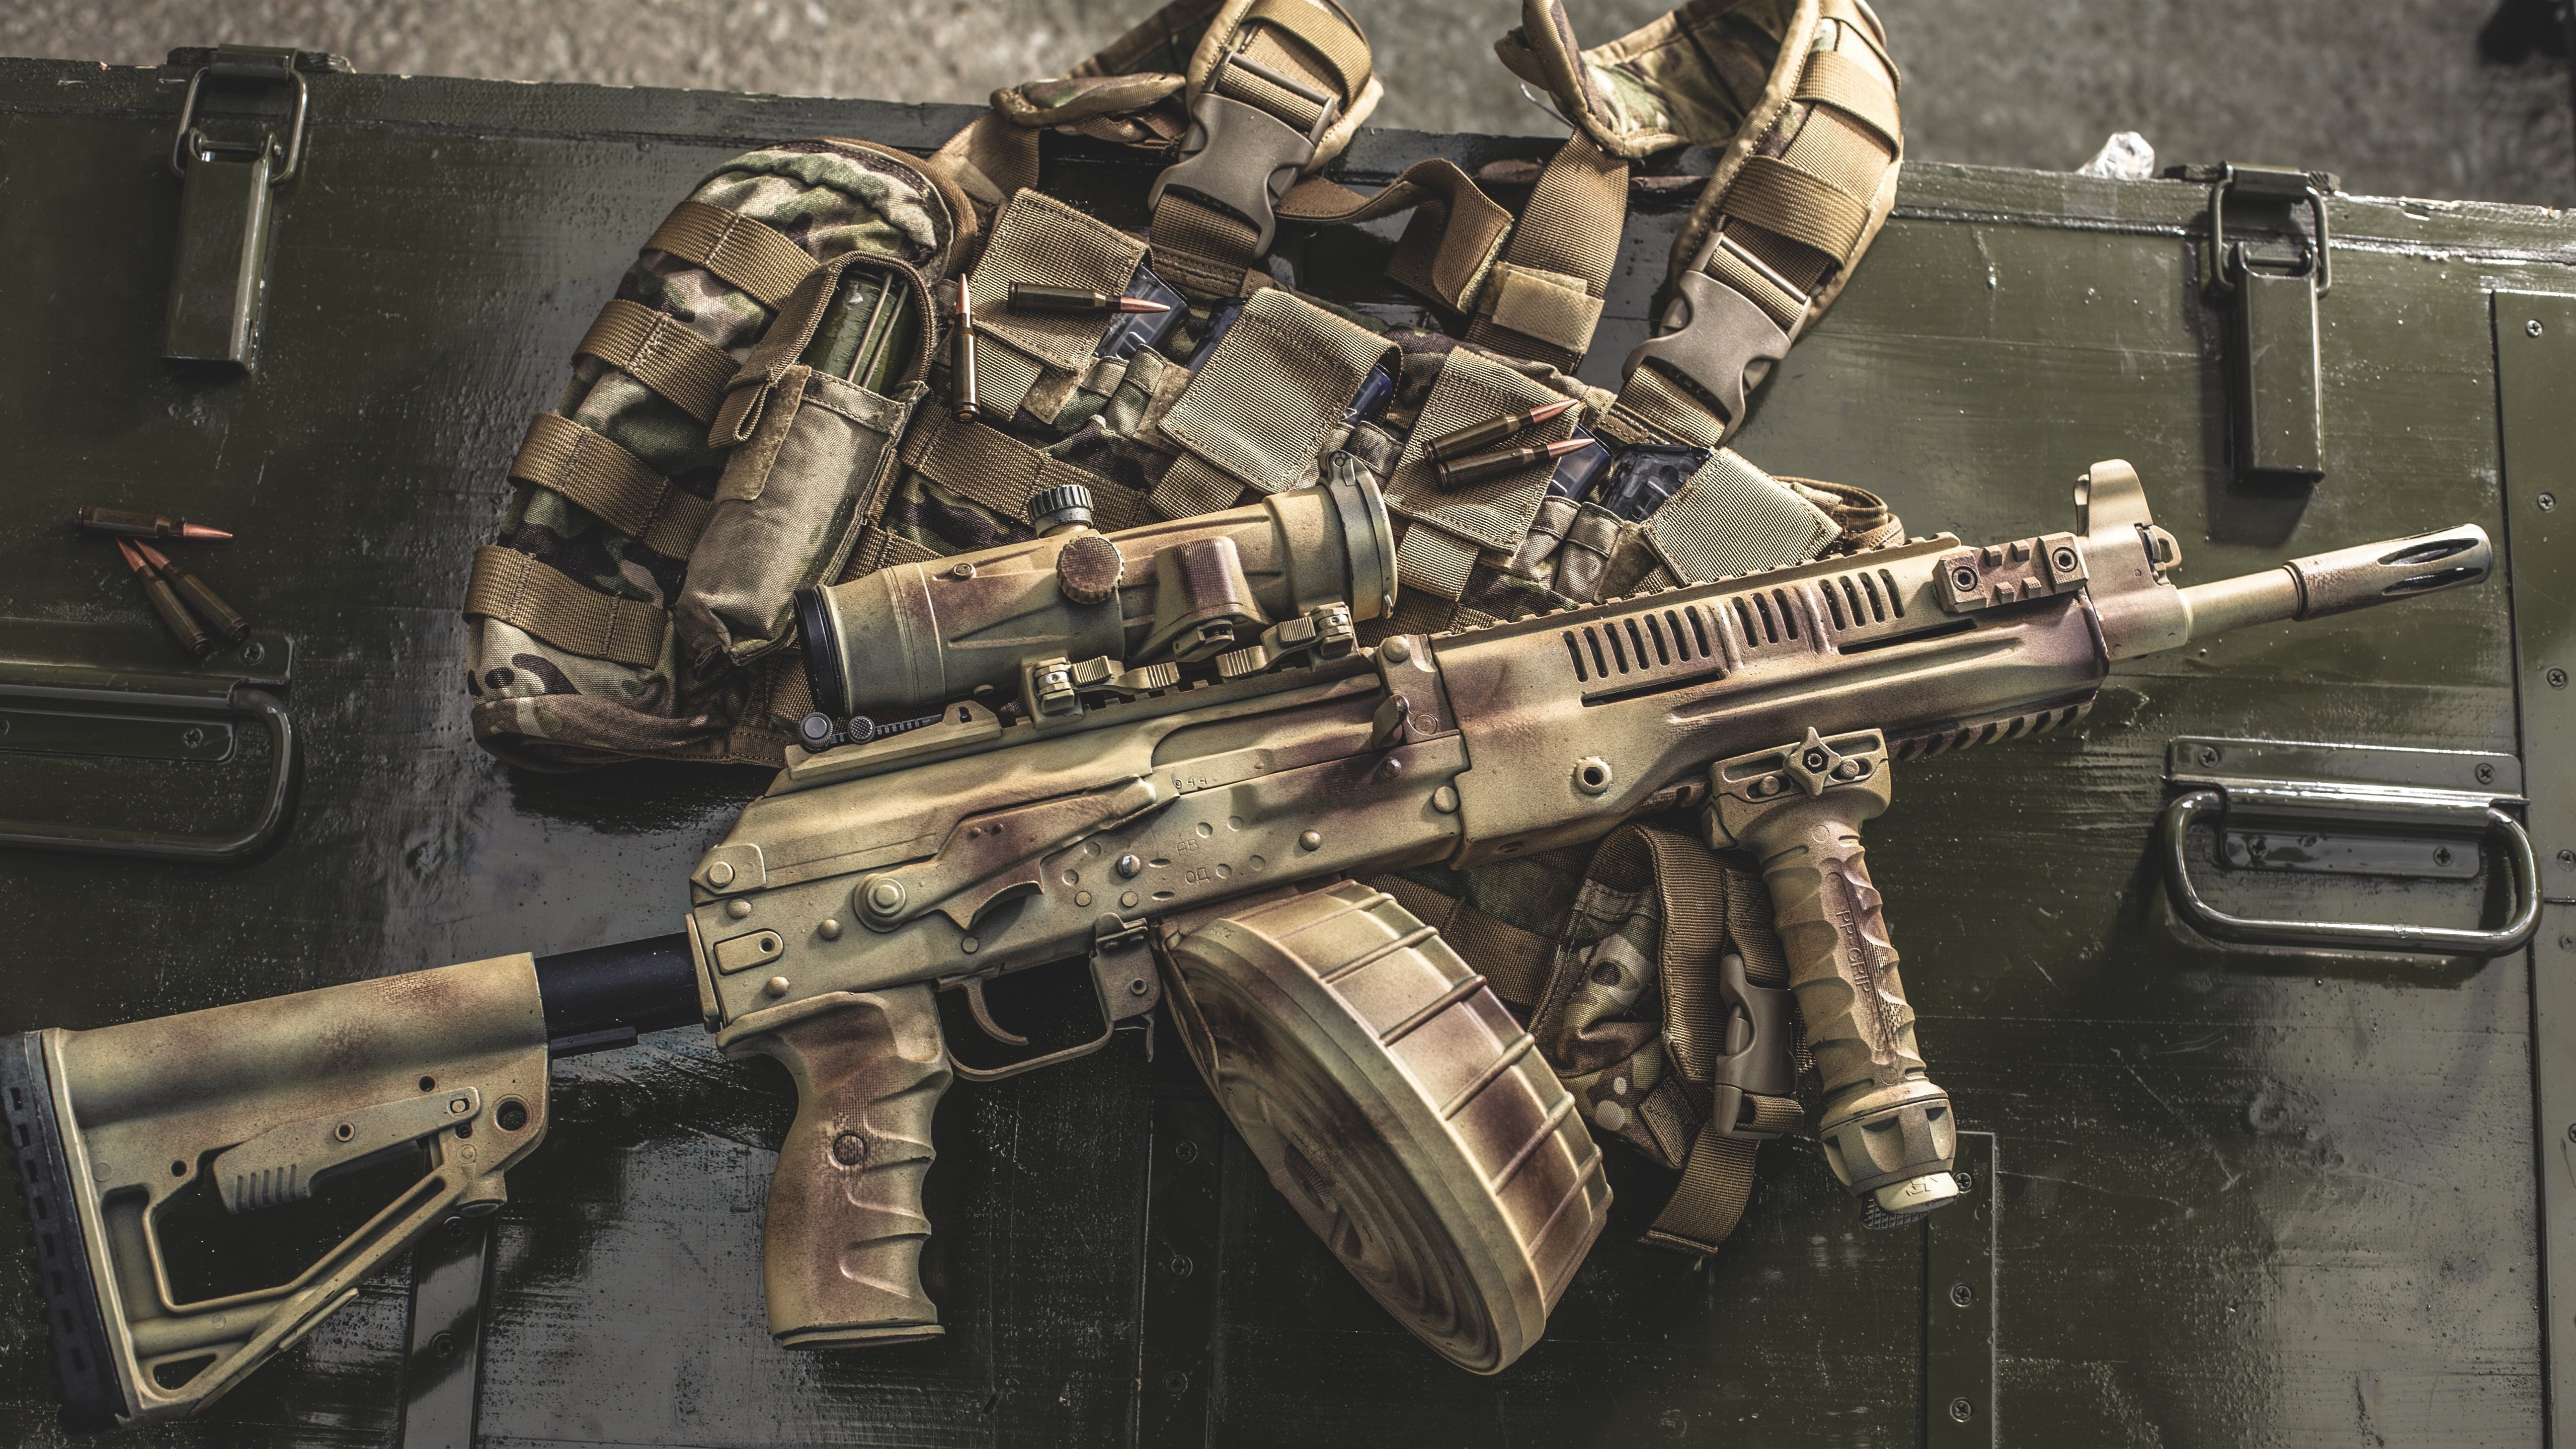 Wallpaper Rpk 16 Lmg Light Machine Gun 5120x2880 Uhd 5k